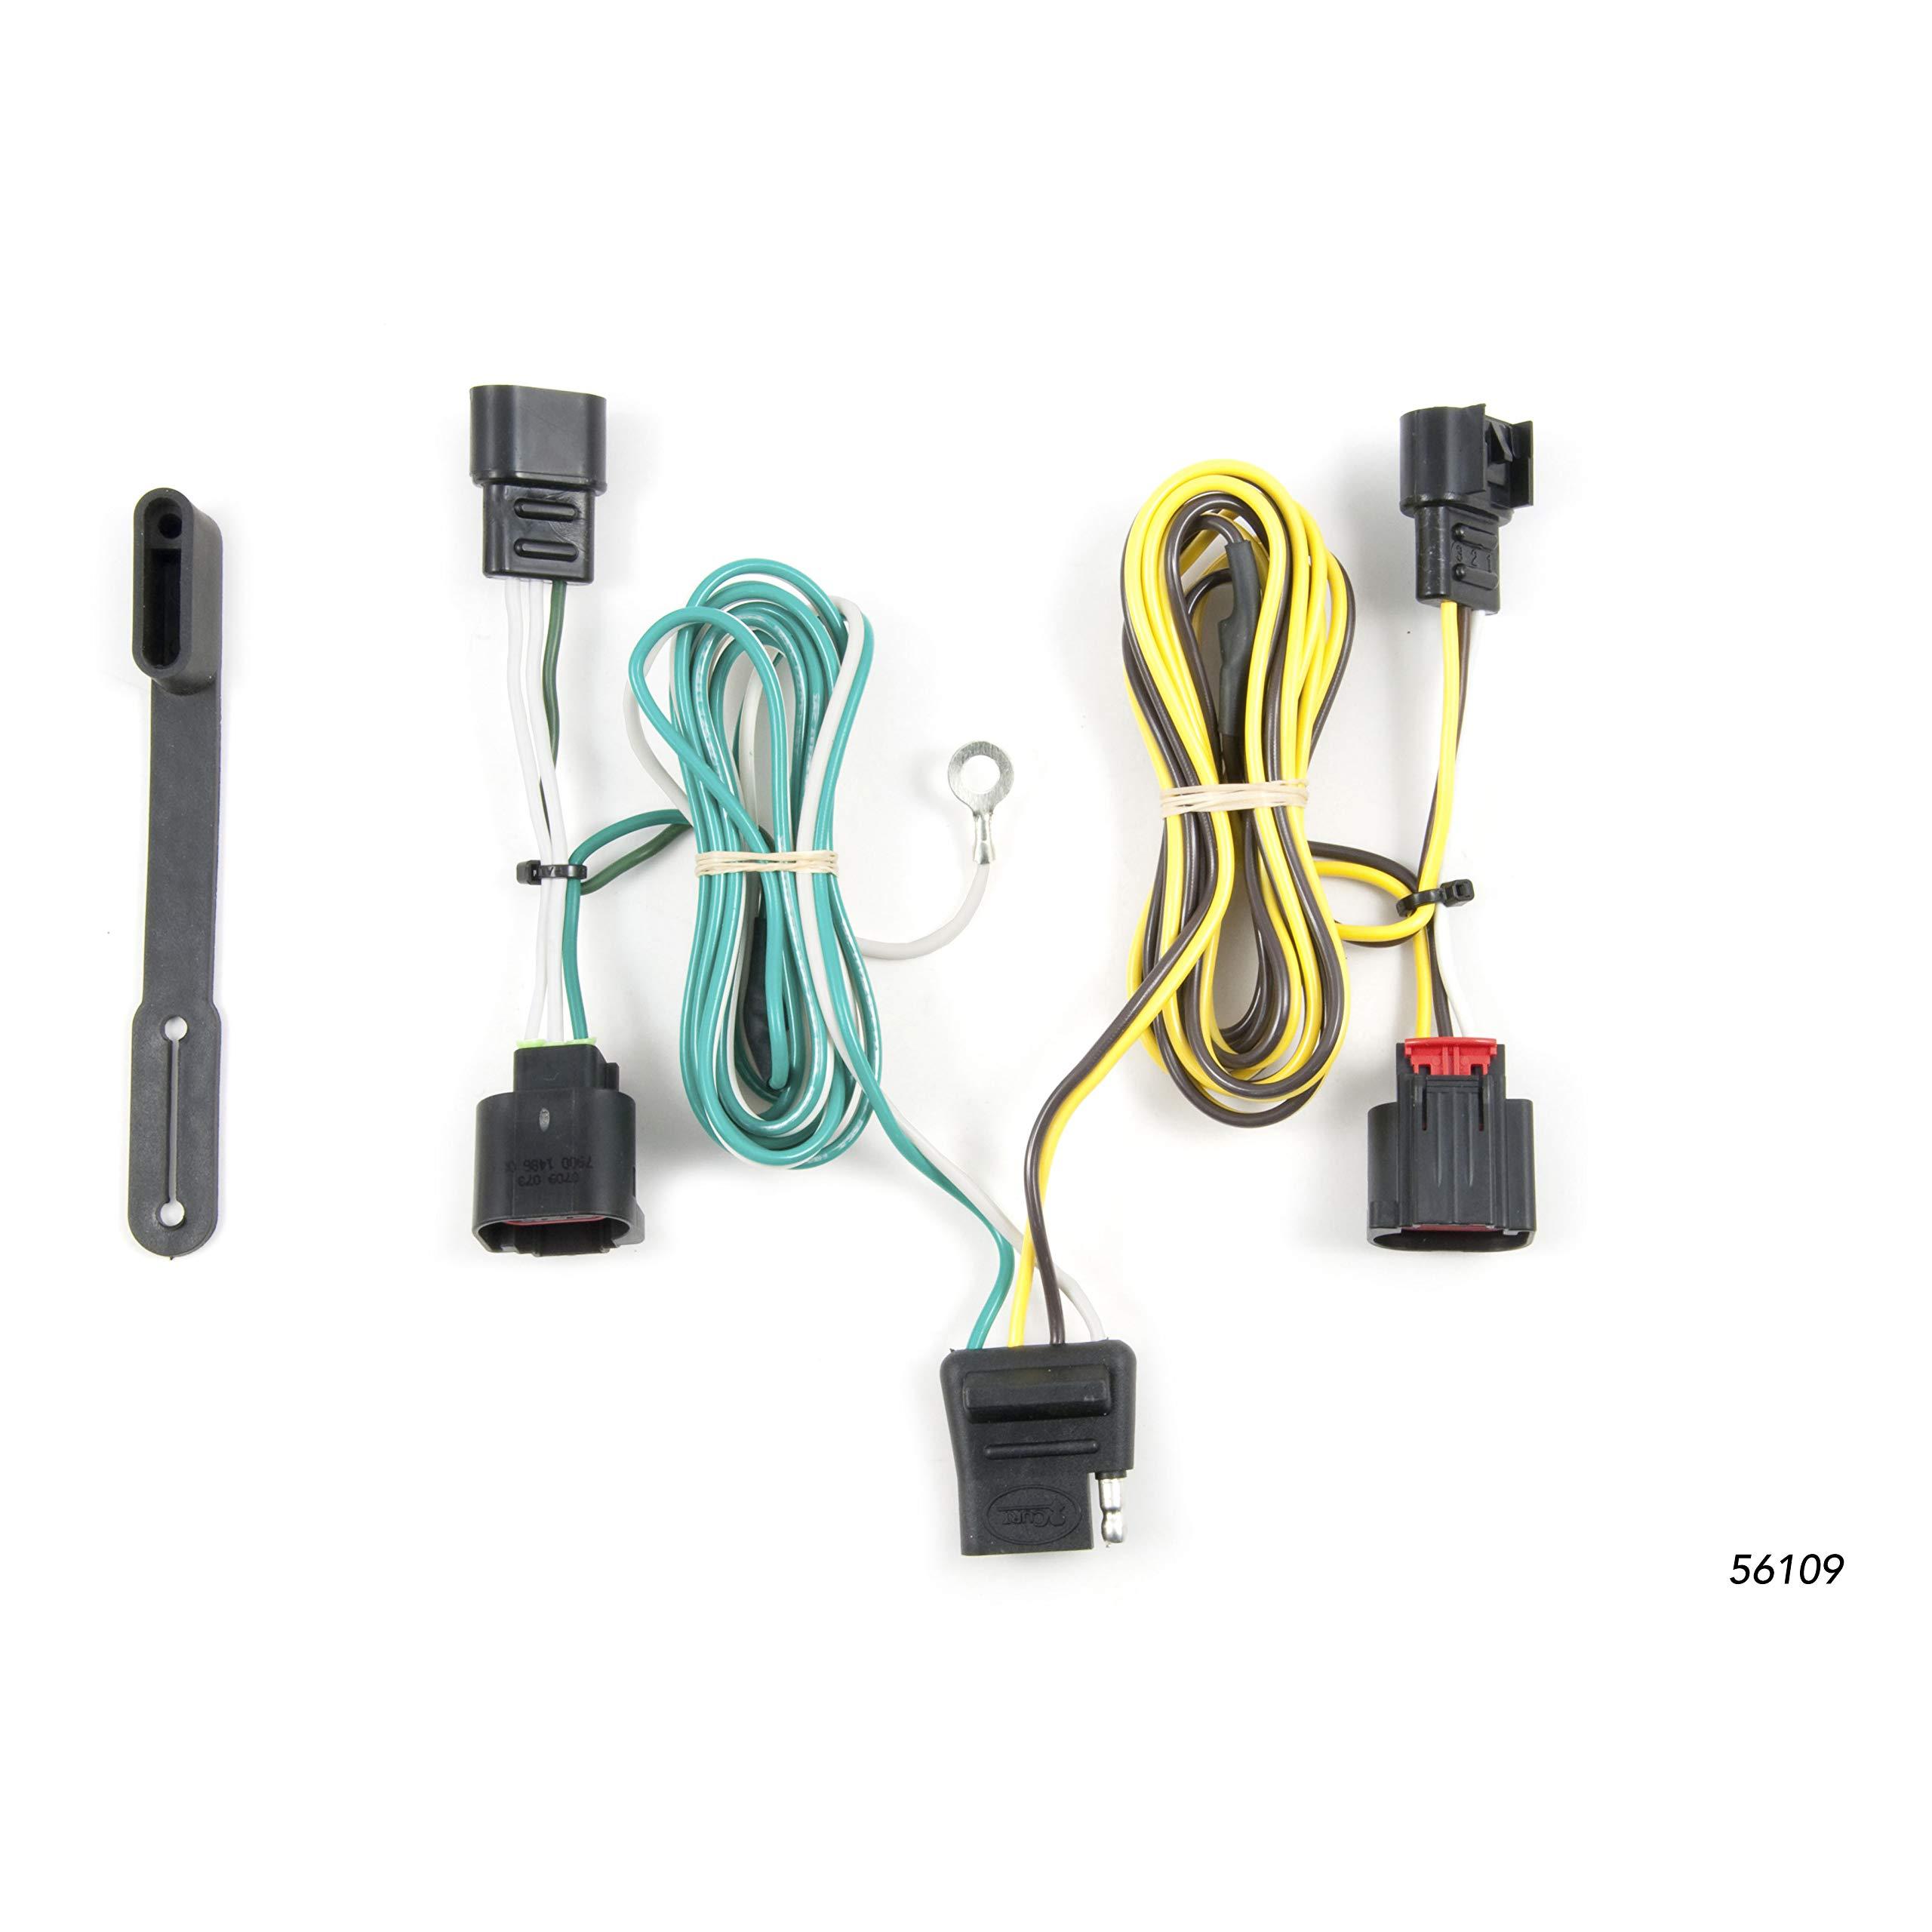 CURT Manufacturing 56109 Vehicle-Side Custom 4-Pin Trailer